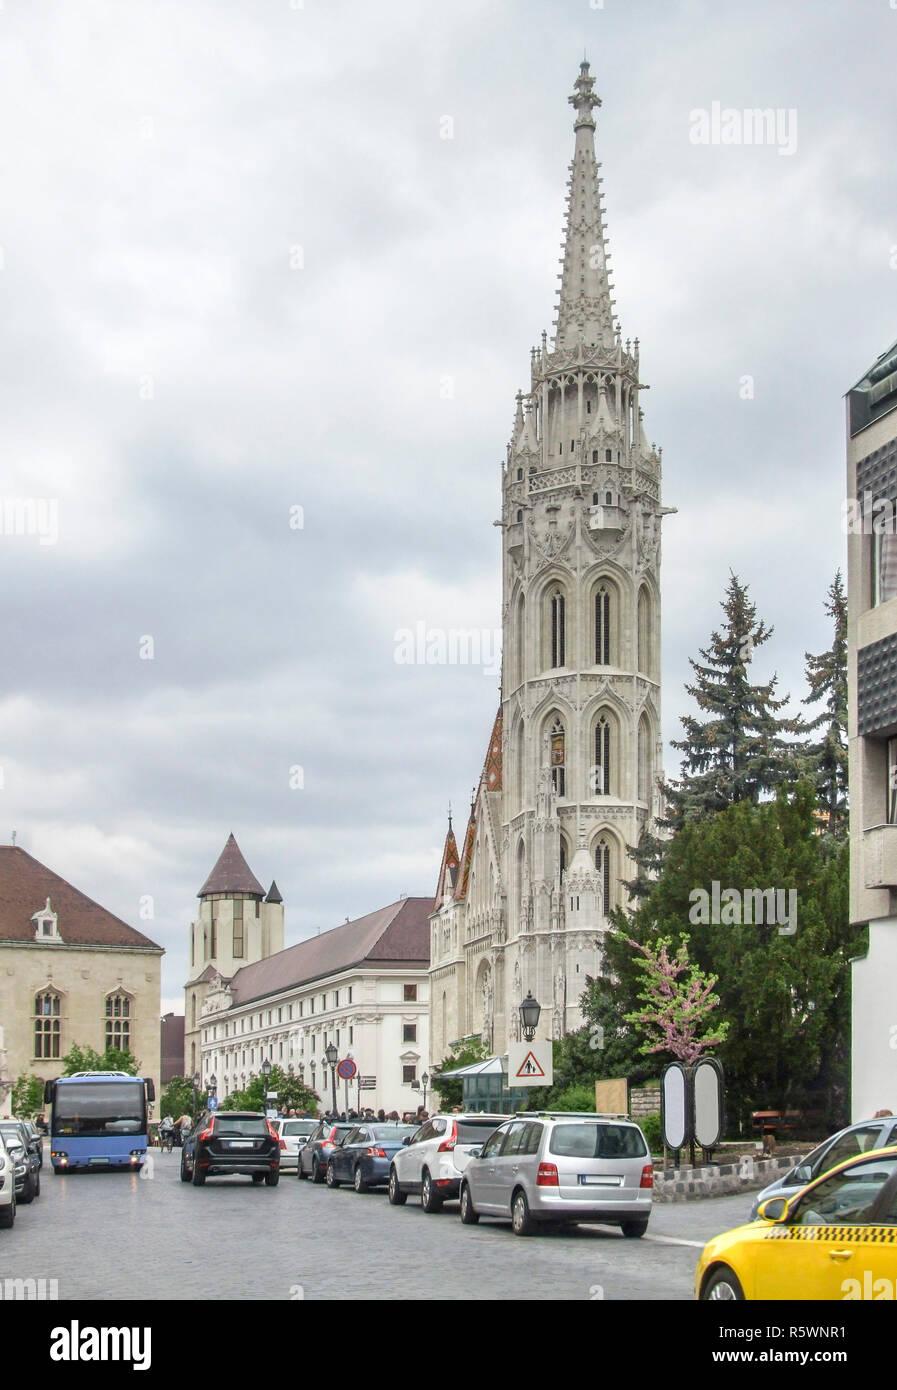 matthias church in budapest - Stock Image